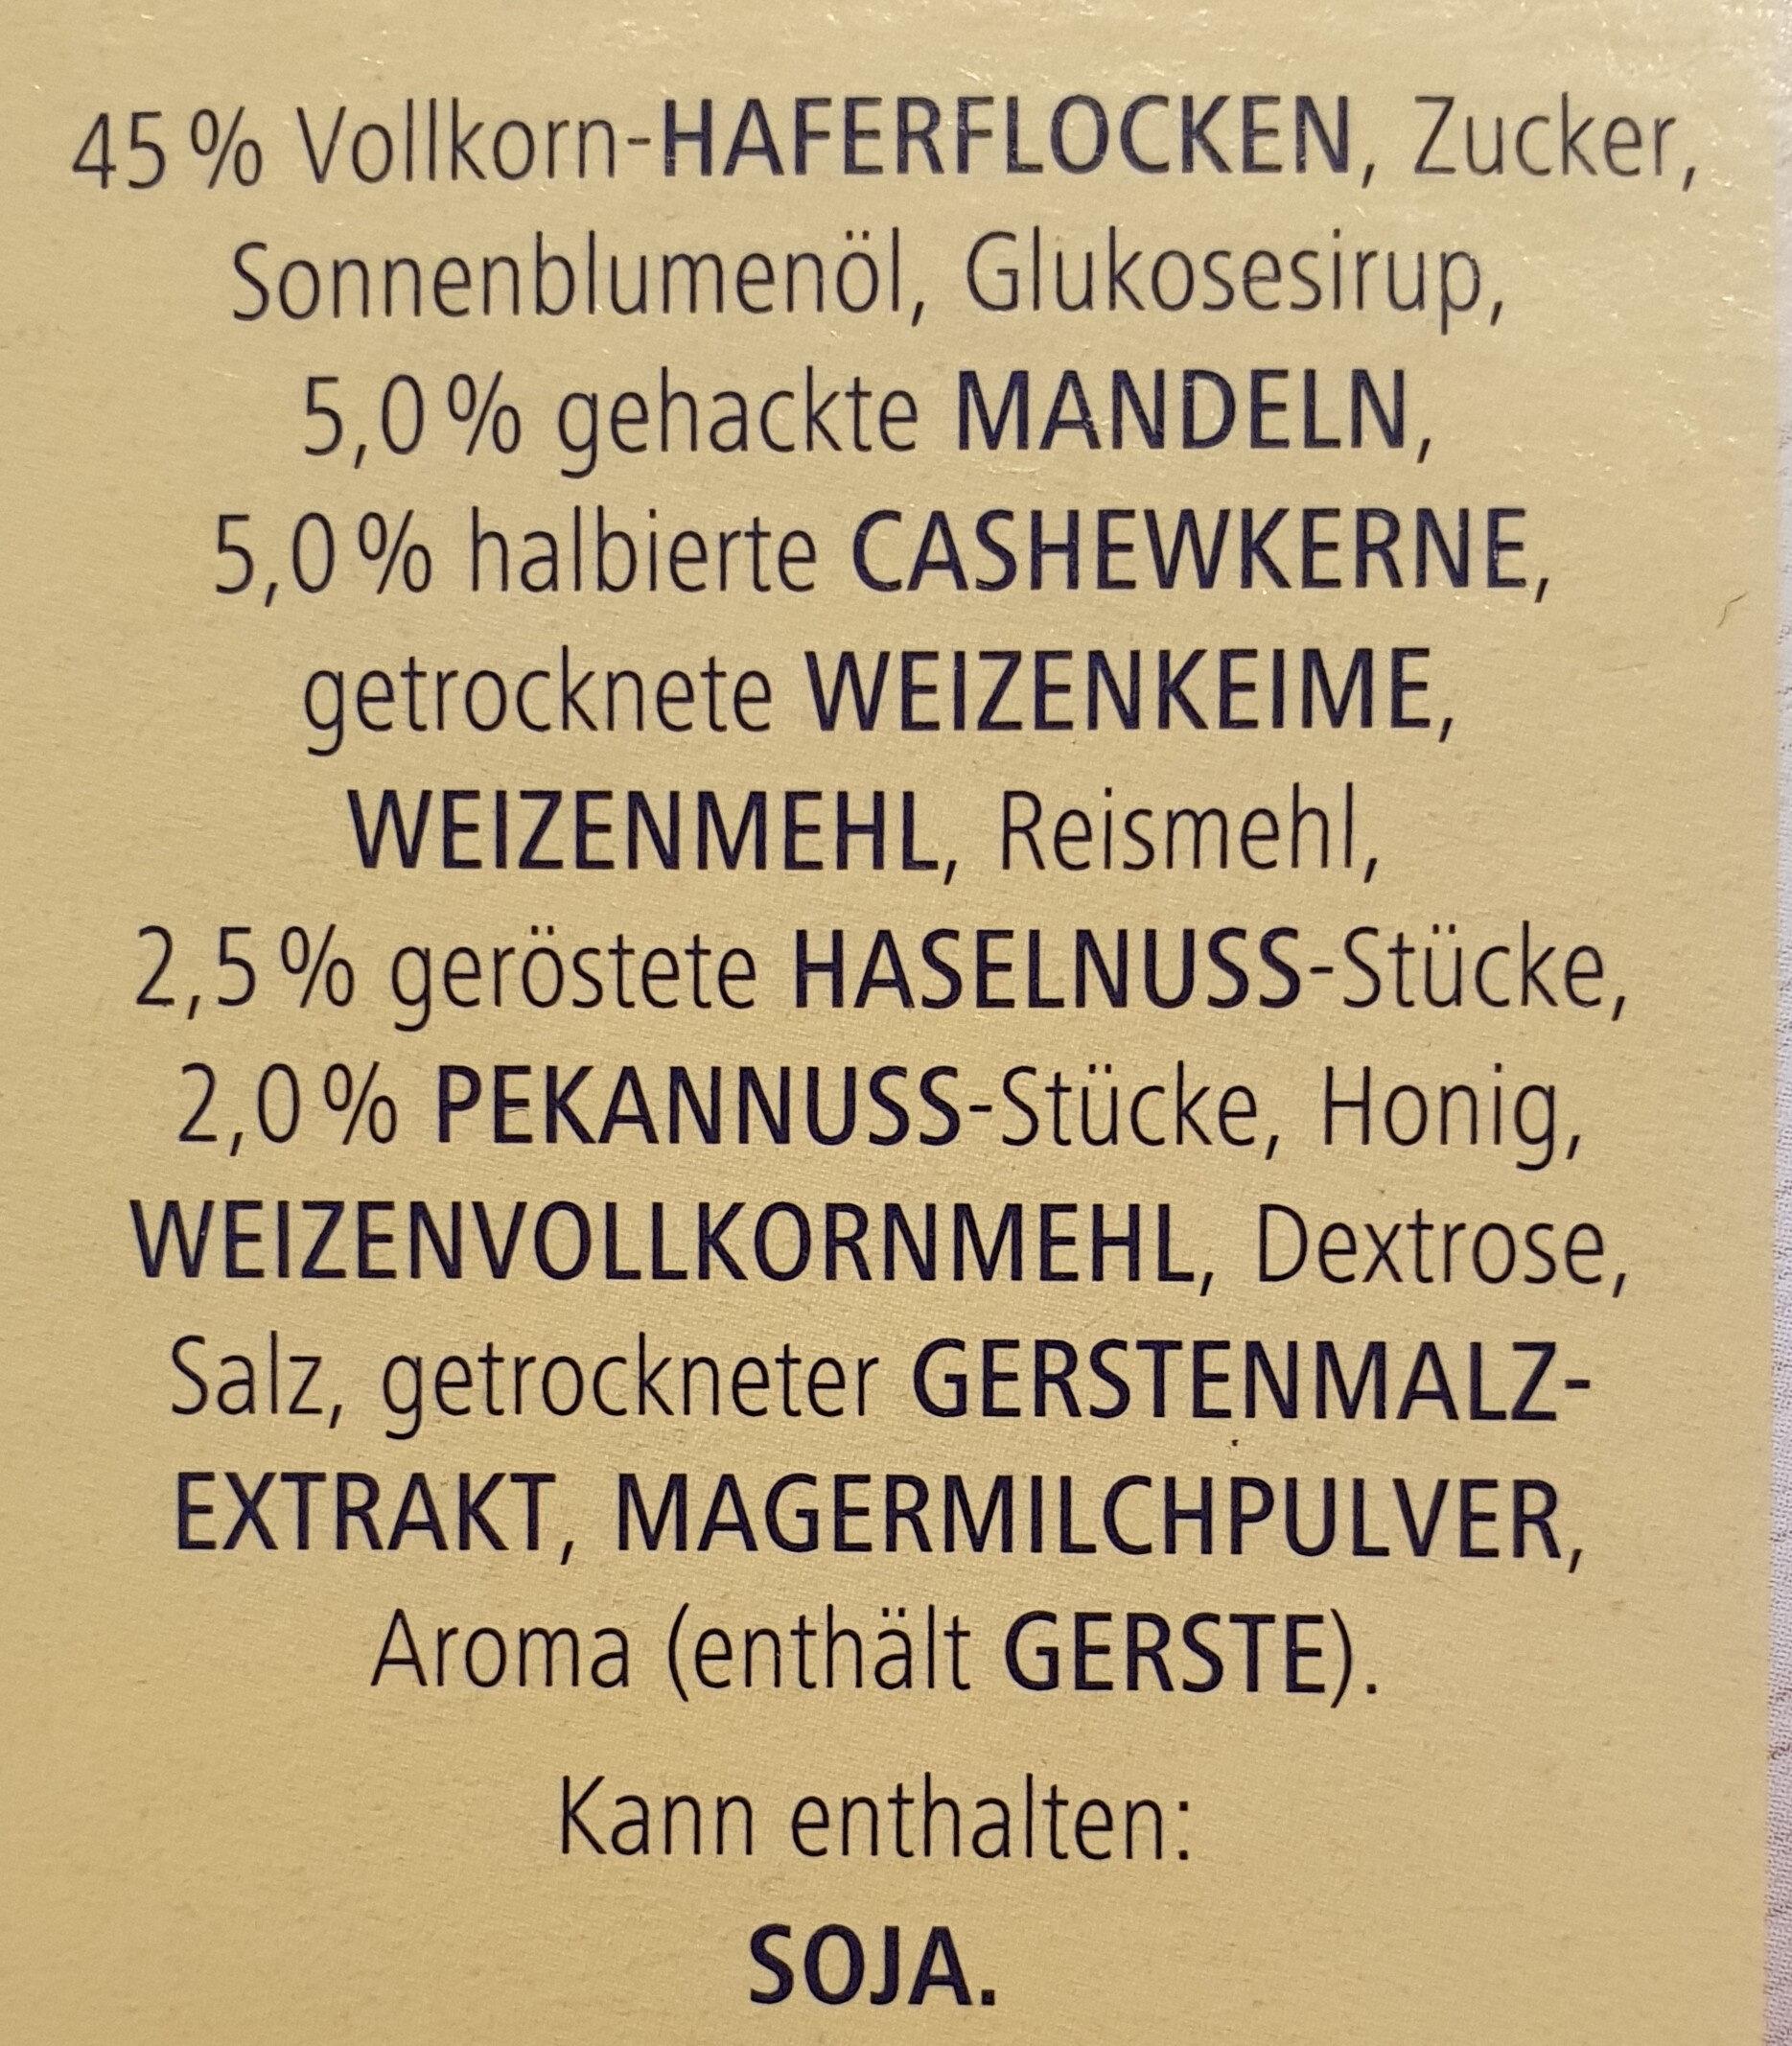 Vitalis knusper Müsli Plus - Ingredients - de